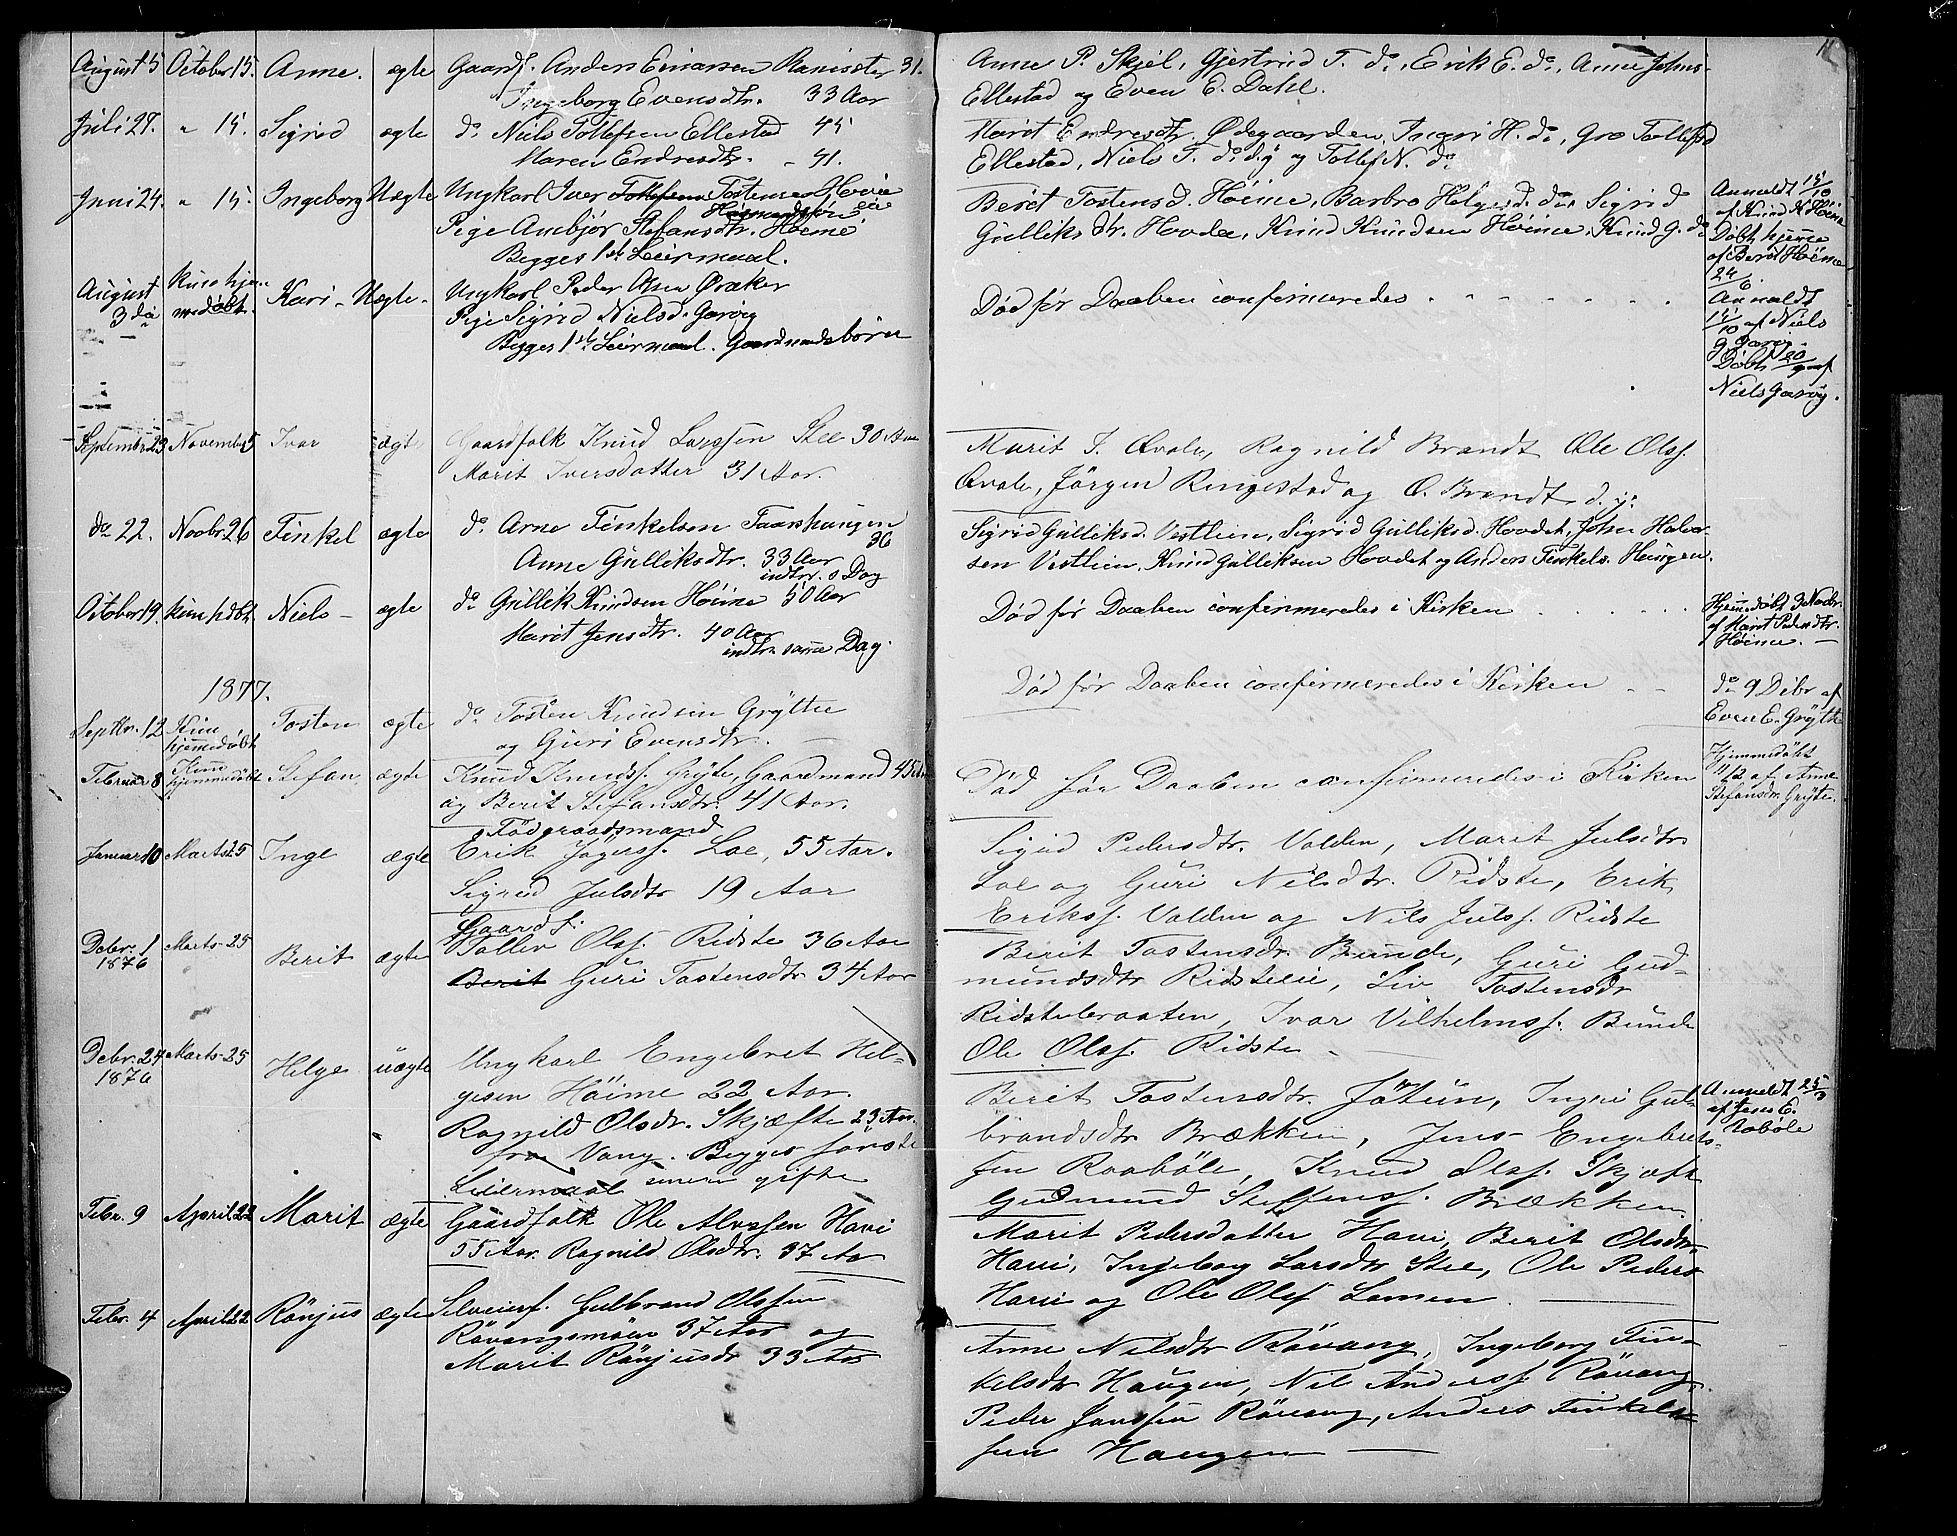 SAH, Vestre Slidre prestekontor, Klokkerbok nr. 2, 1869-1882, s. 11